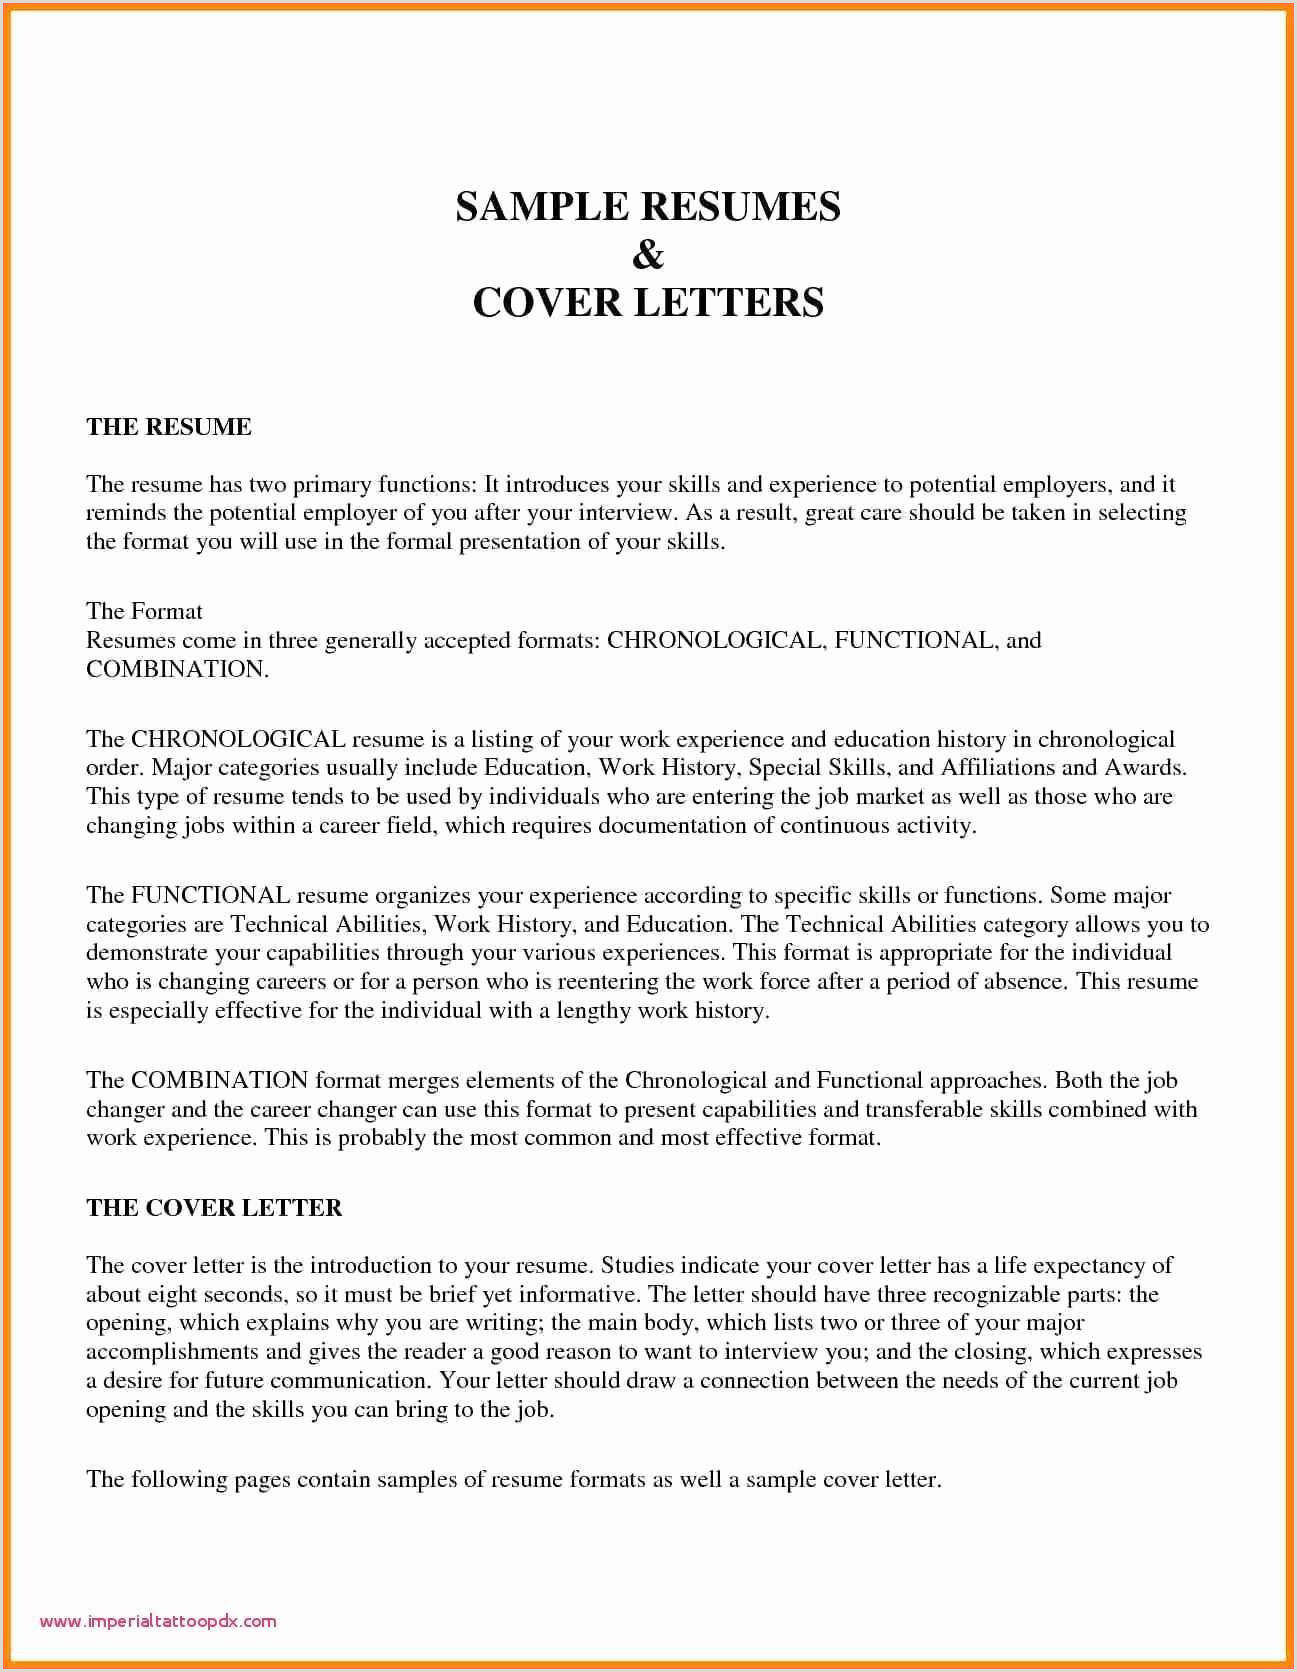 Inspirational Sample Resume Templates – 50ger